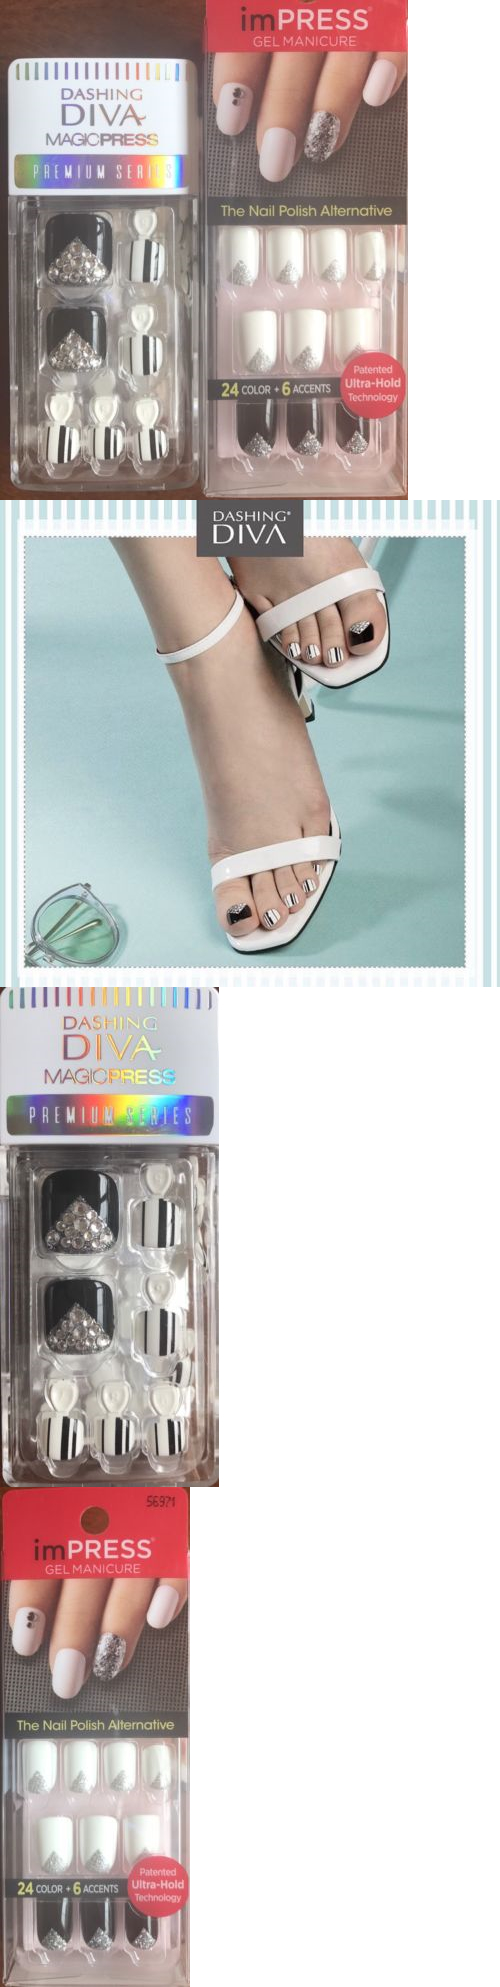 Press-On Nails: Dashing Diva Press On Nails Toe And Kiss Impress ...